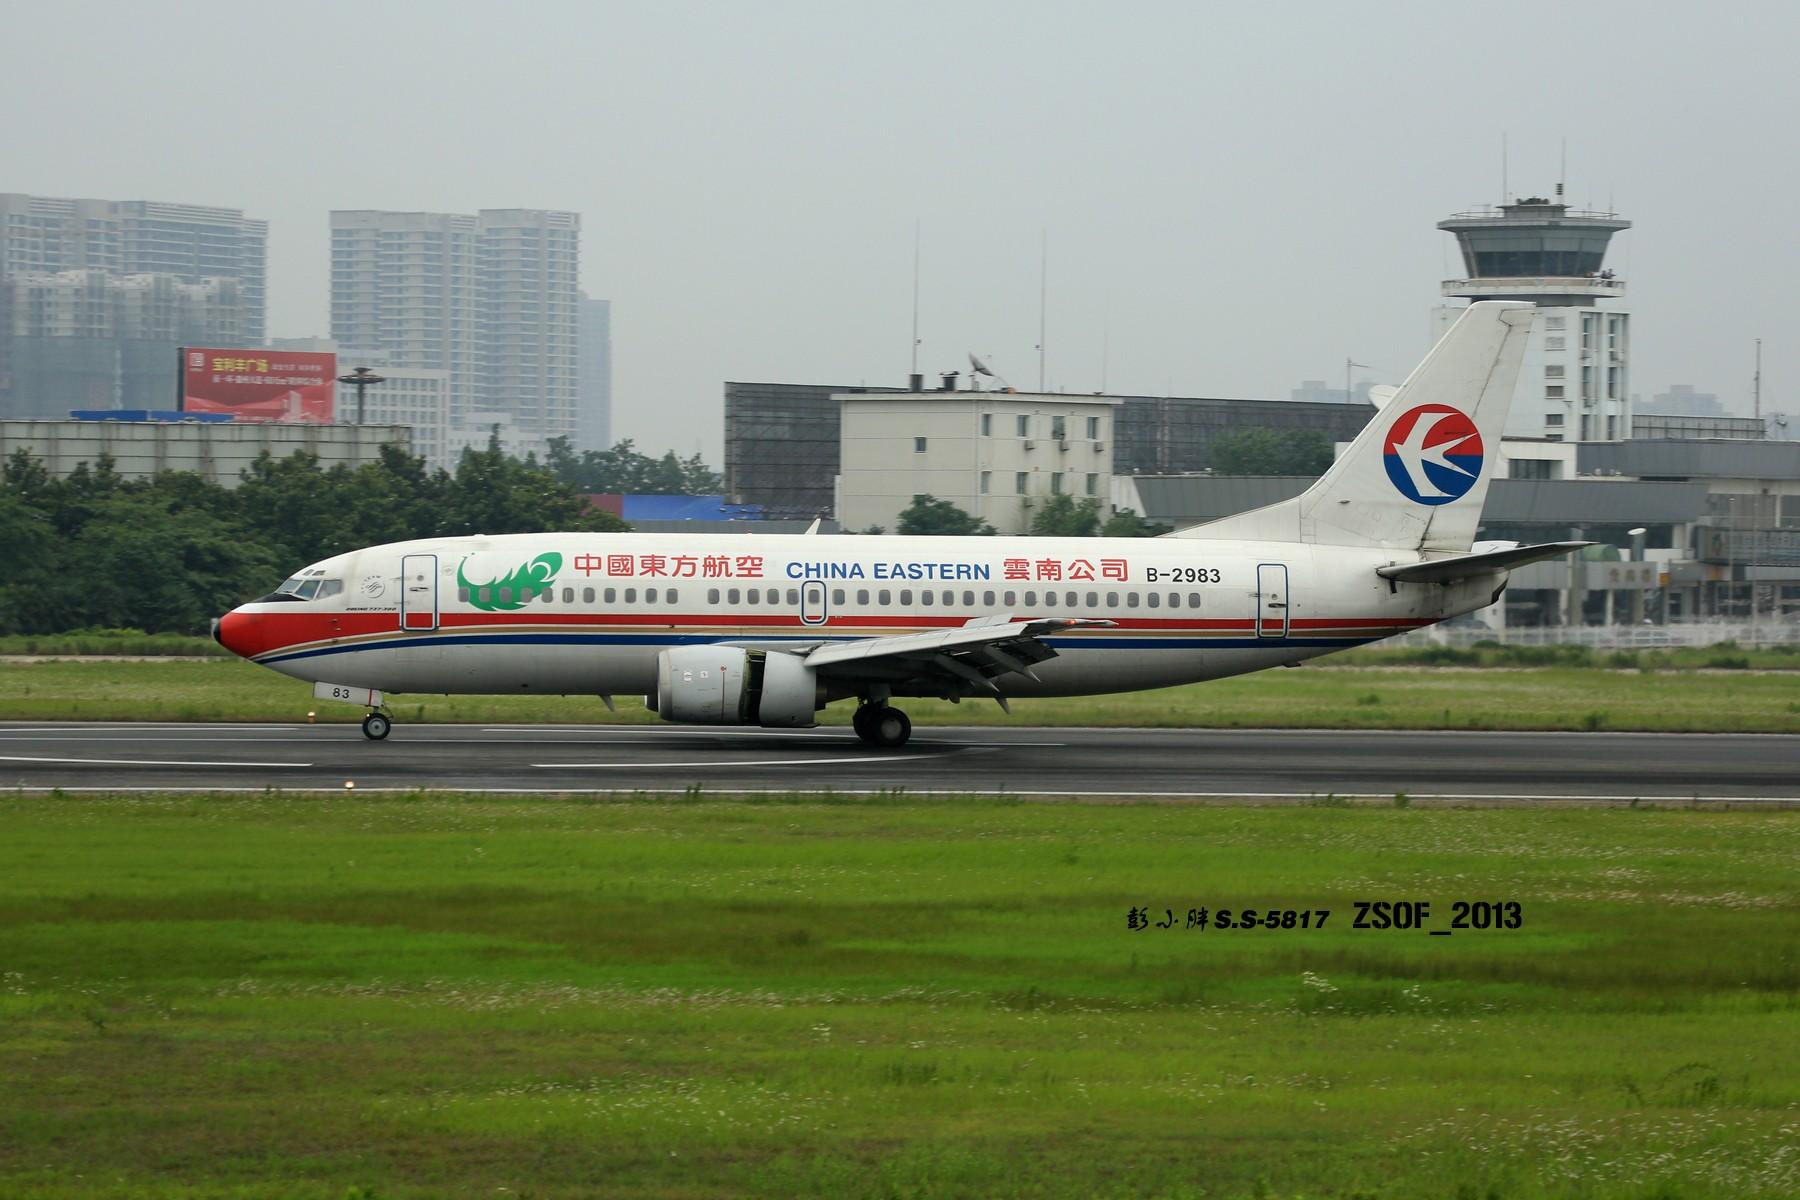 Re:[原创]【骆幕迎新】骆岗LastDay 纪念曾经属于我们的骆岗 BOEING 737-300 B-2983 ZSOF